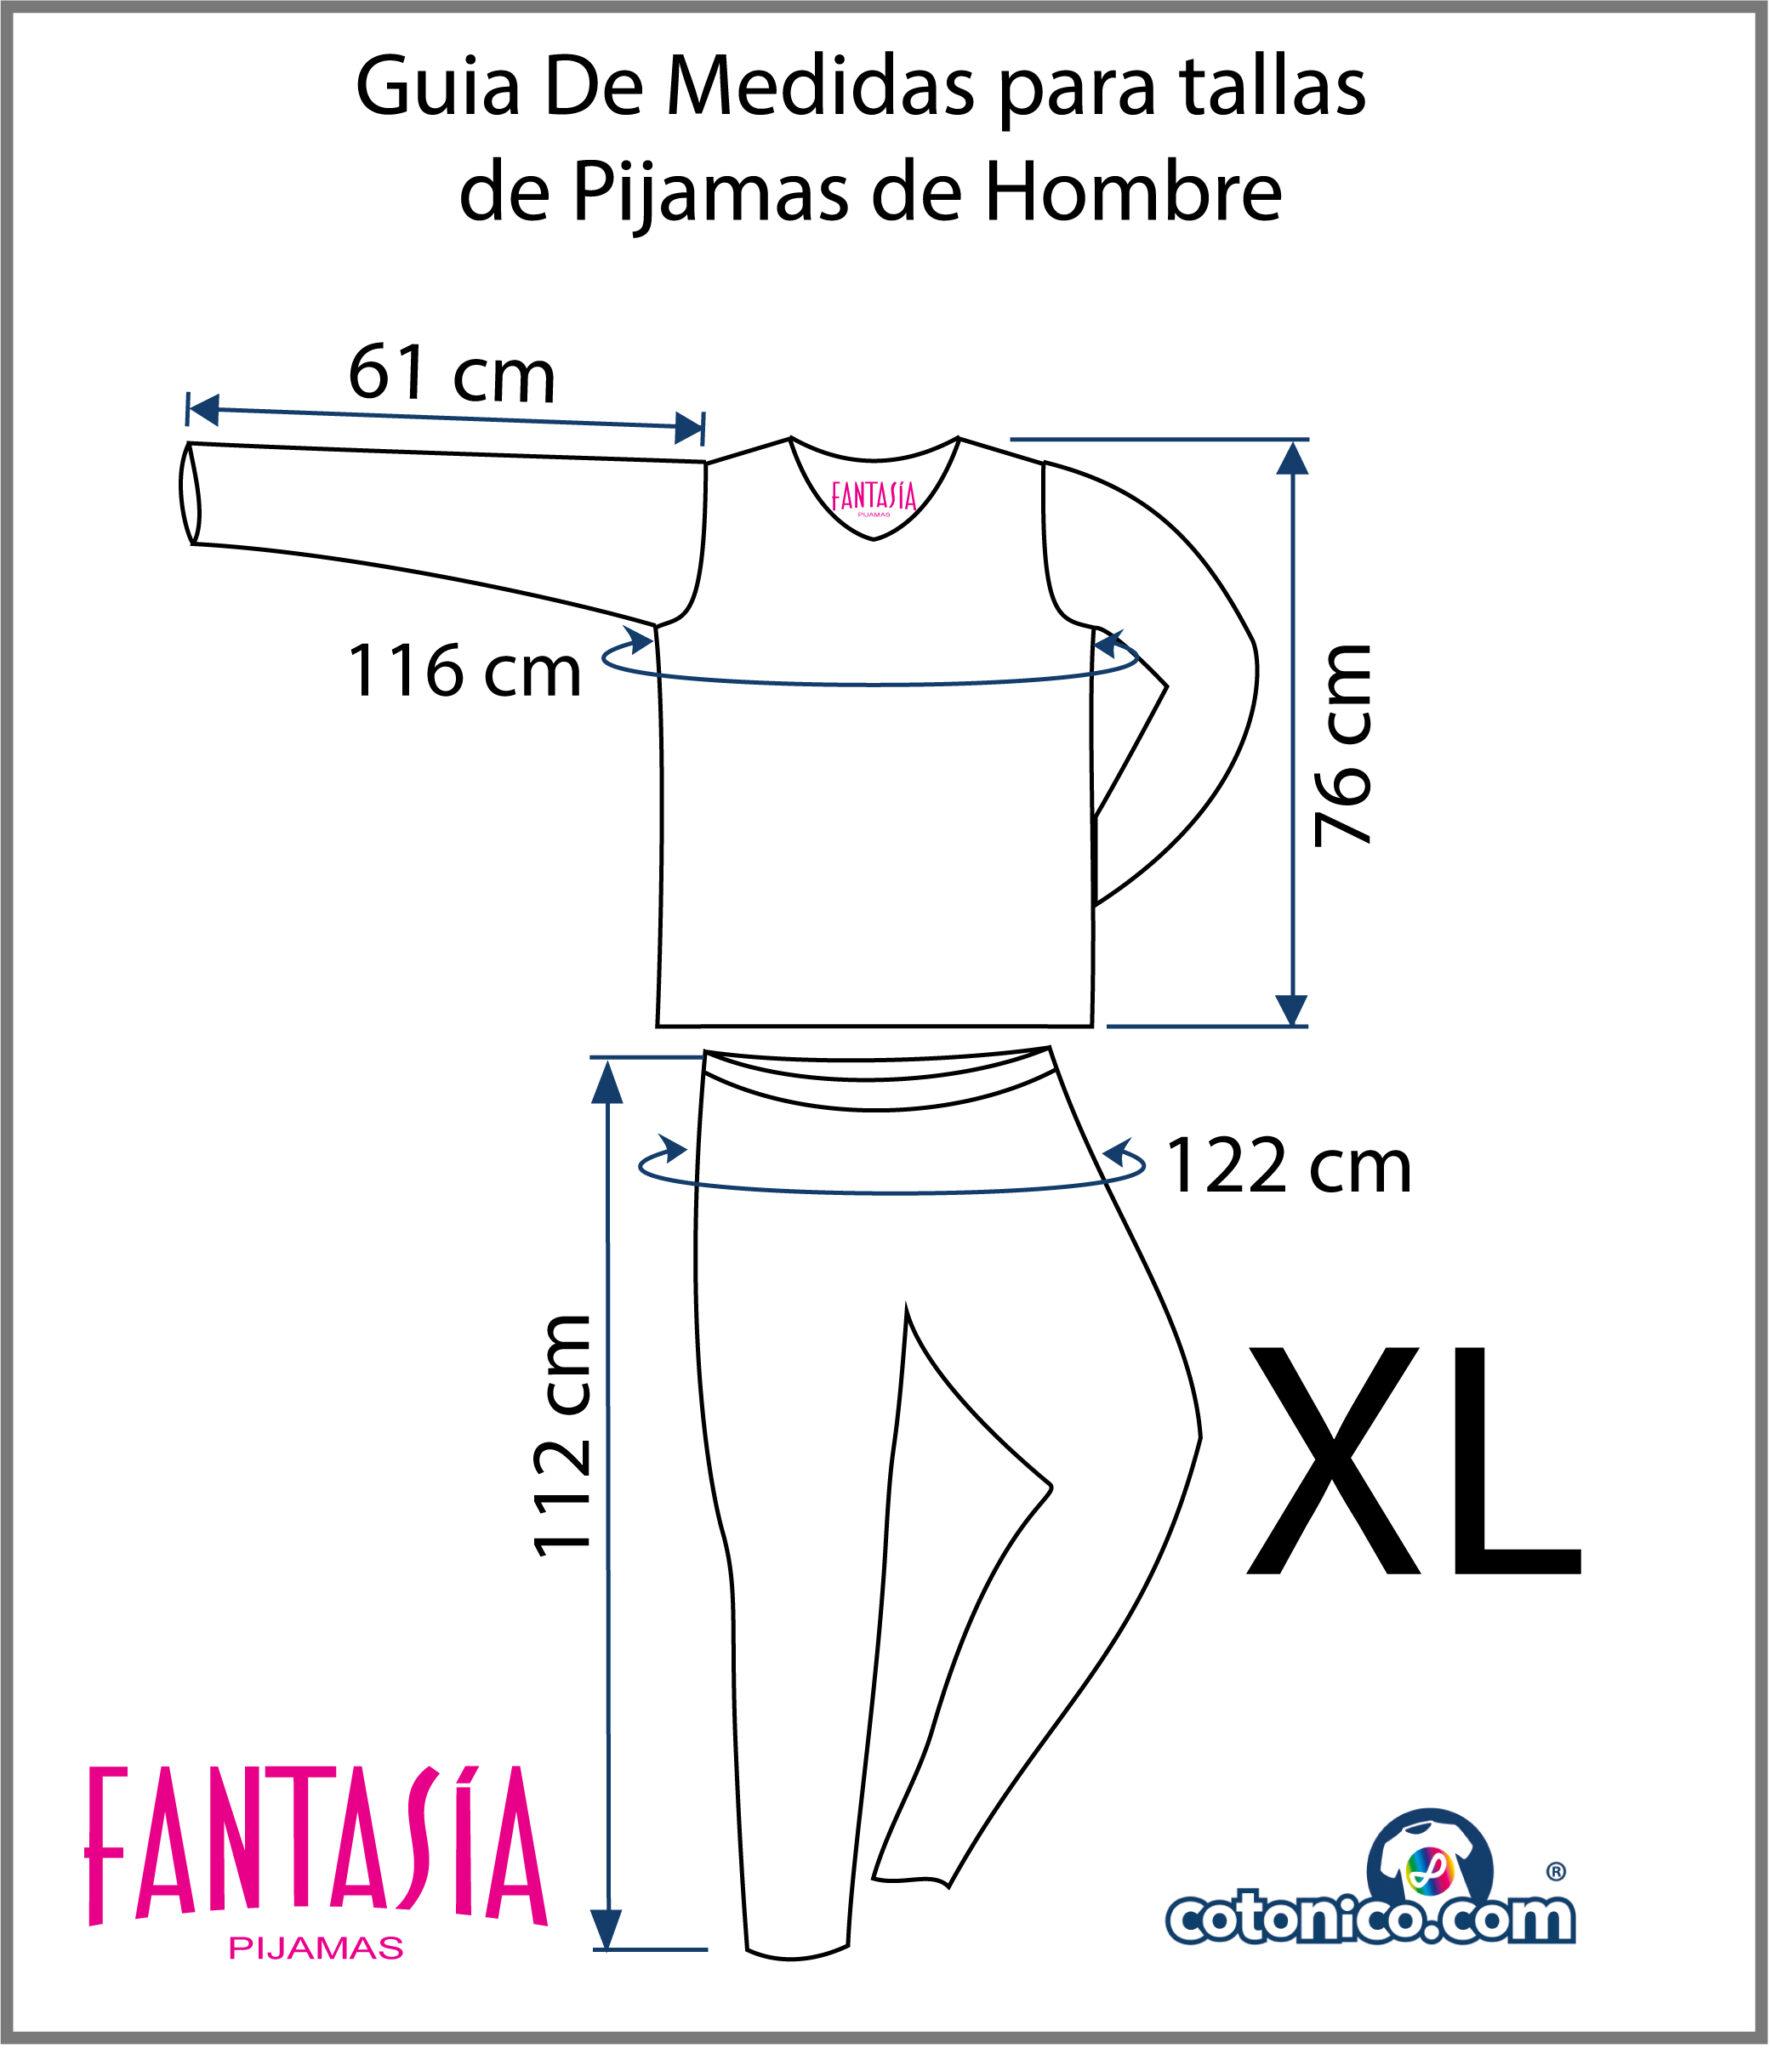 Guia-De-Tallas-Pijamas-De-Hombre-XL